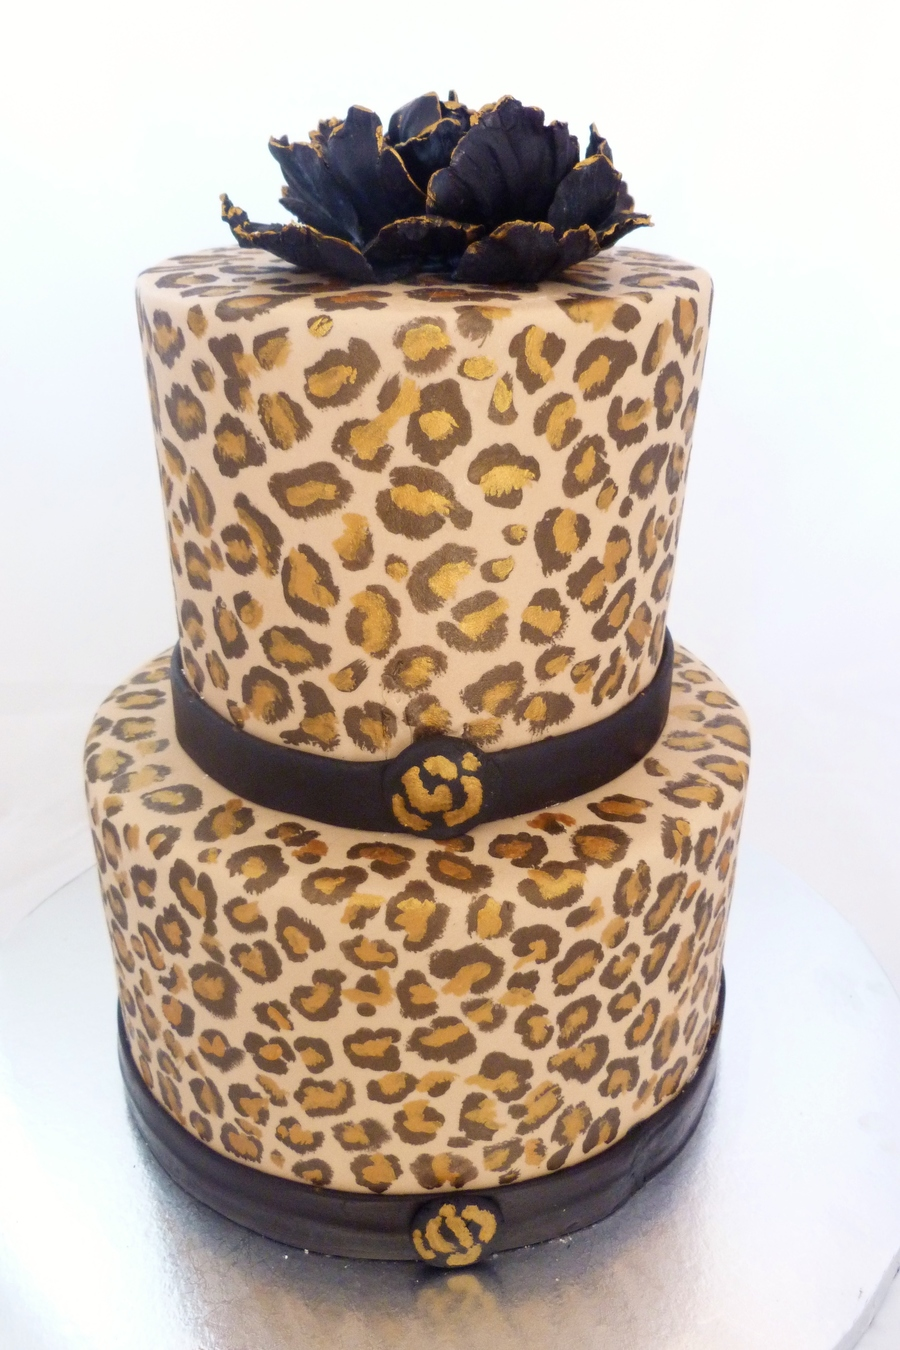 Cheetah Cake Recipe